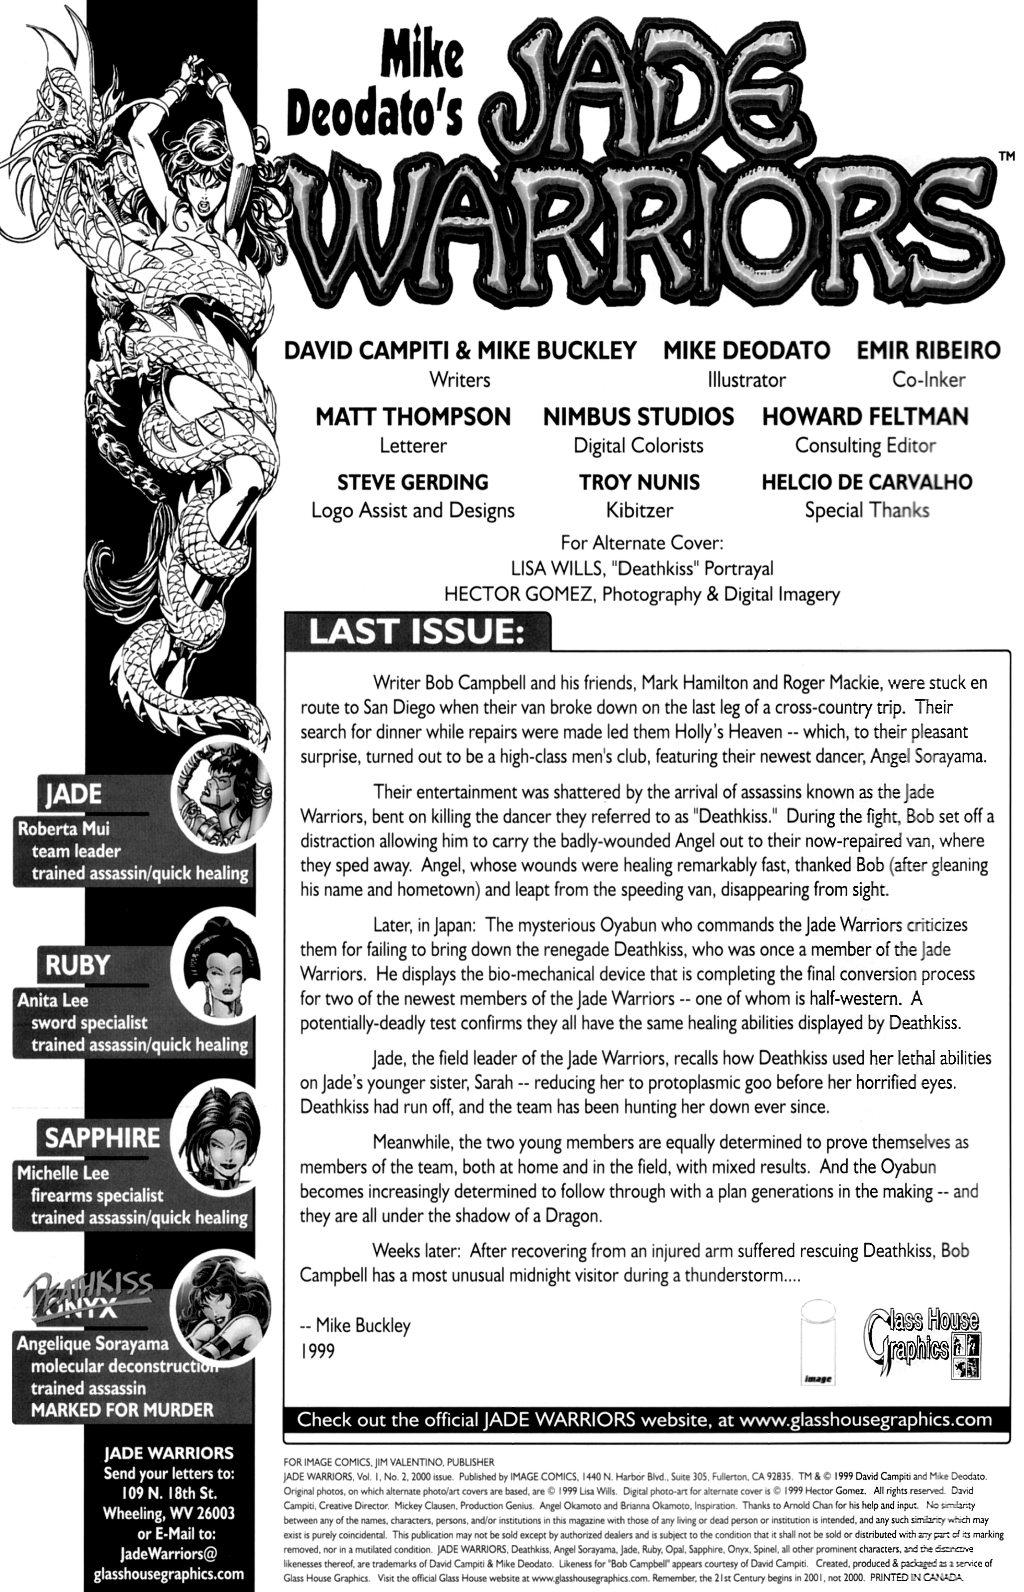 Read online Jade Warriors comic -  Issue #2 - 2